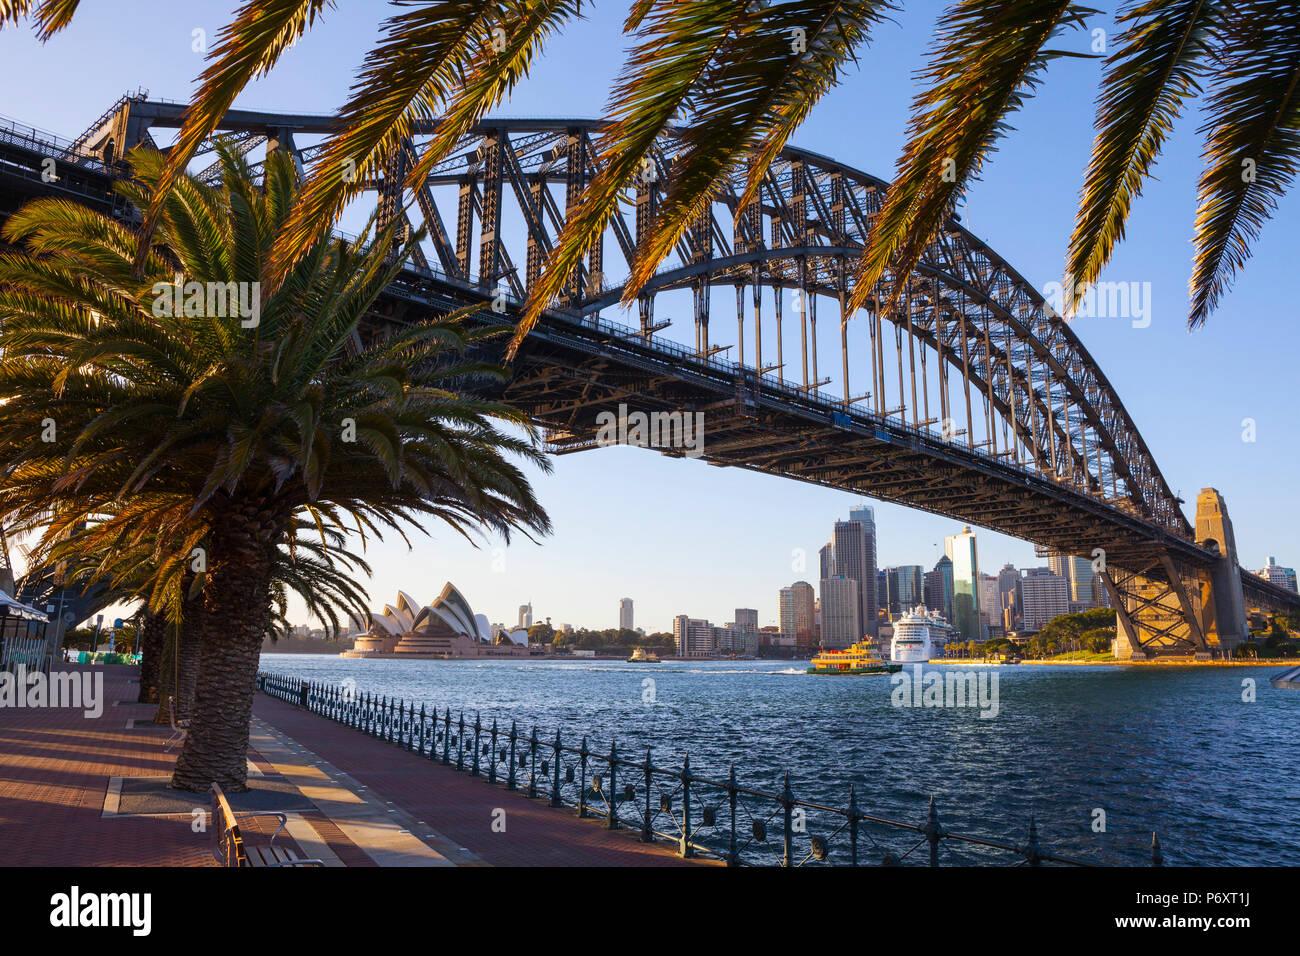 Harbour Bridge, Darling Harbour, Sydney, New South Wales, Australia - Stock Image